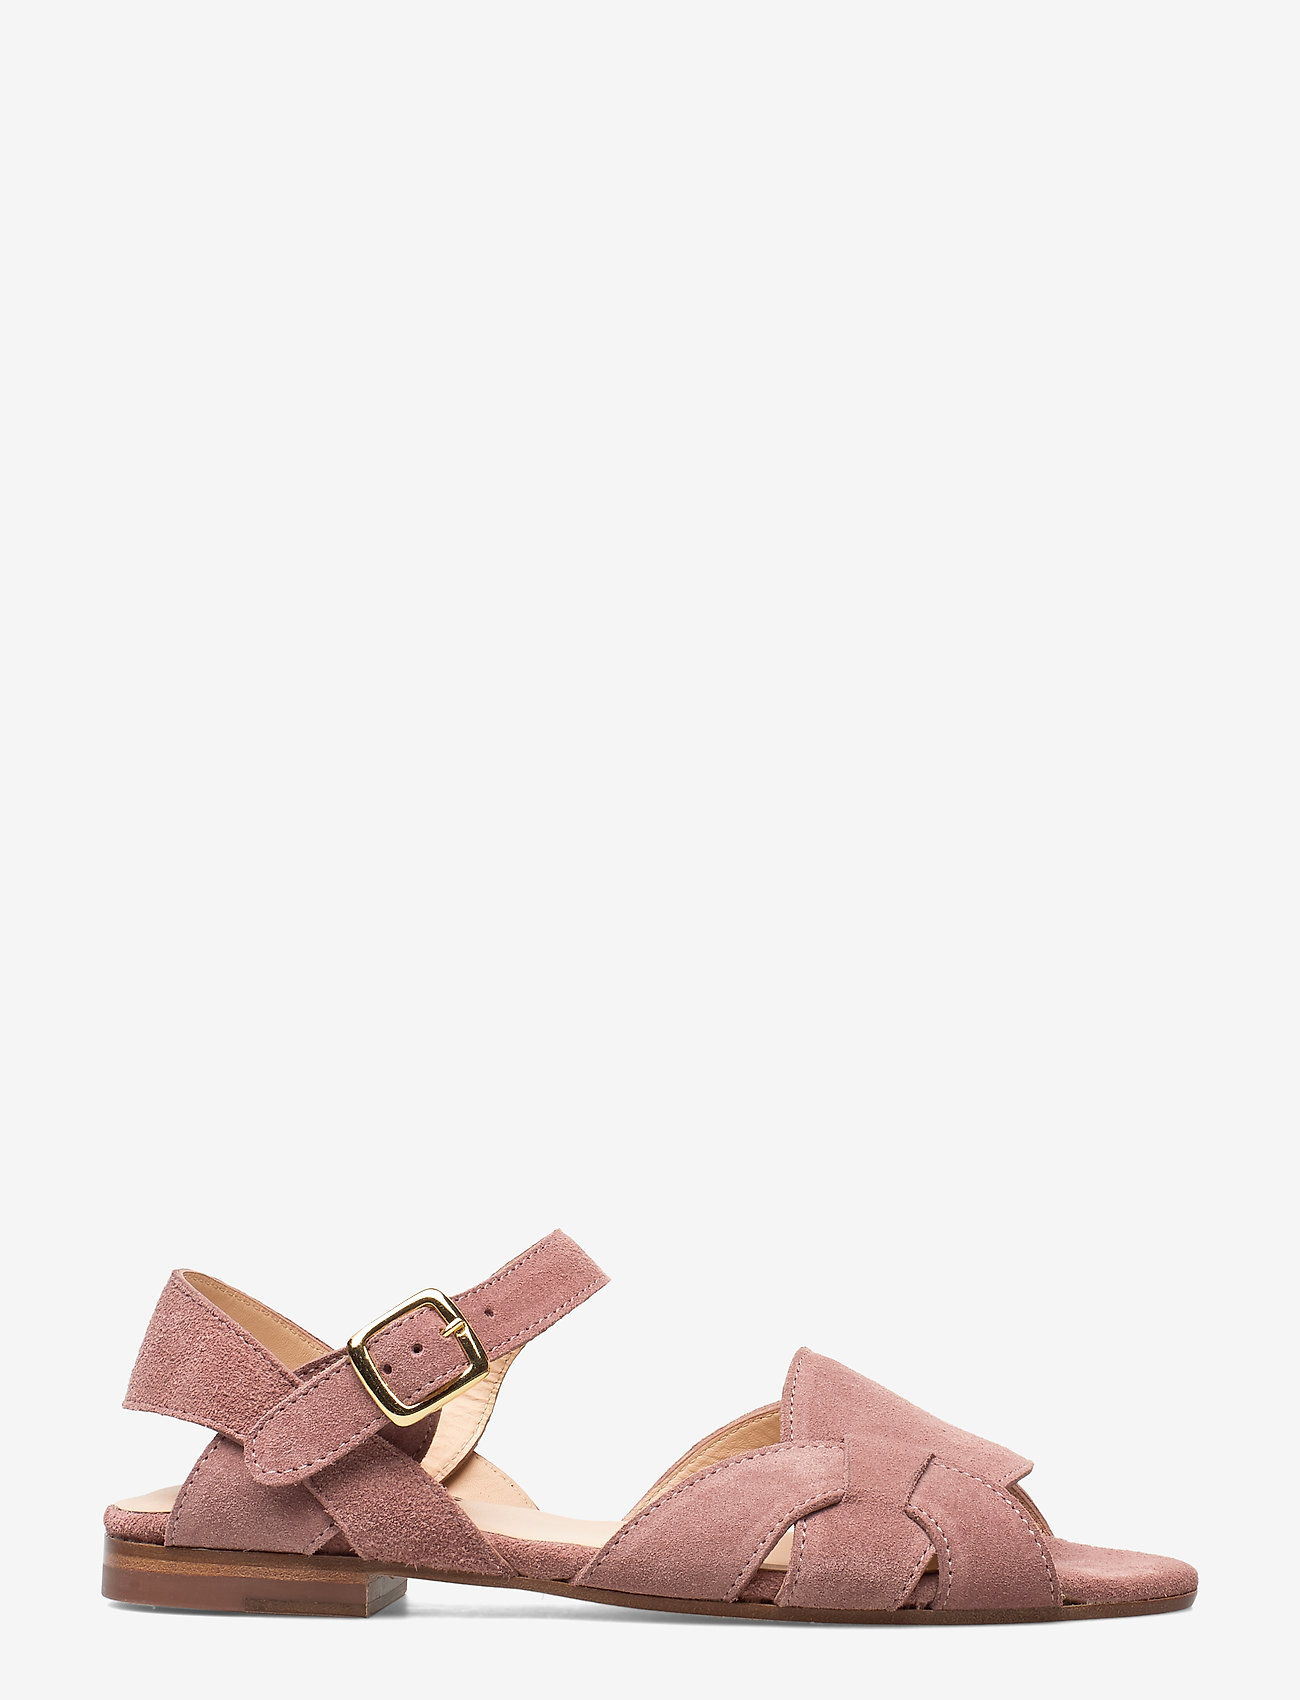 ANGULUS - Sandals - flat - flache sandalen - 2194 powder - 1